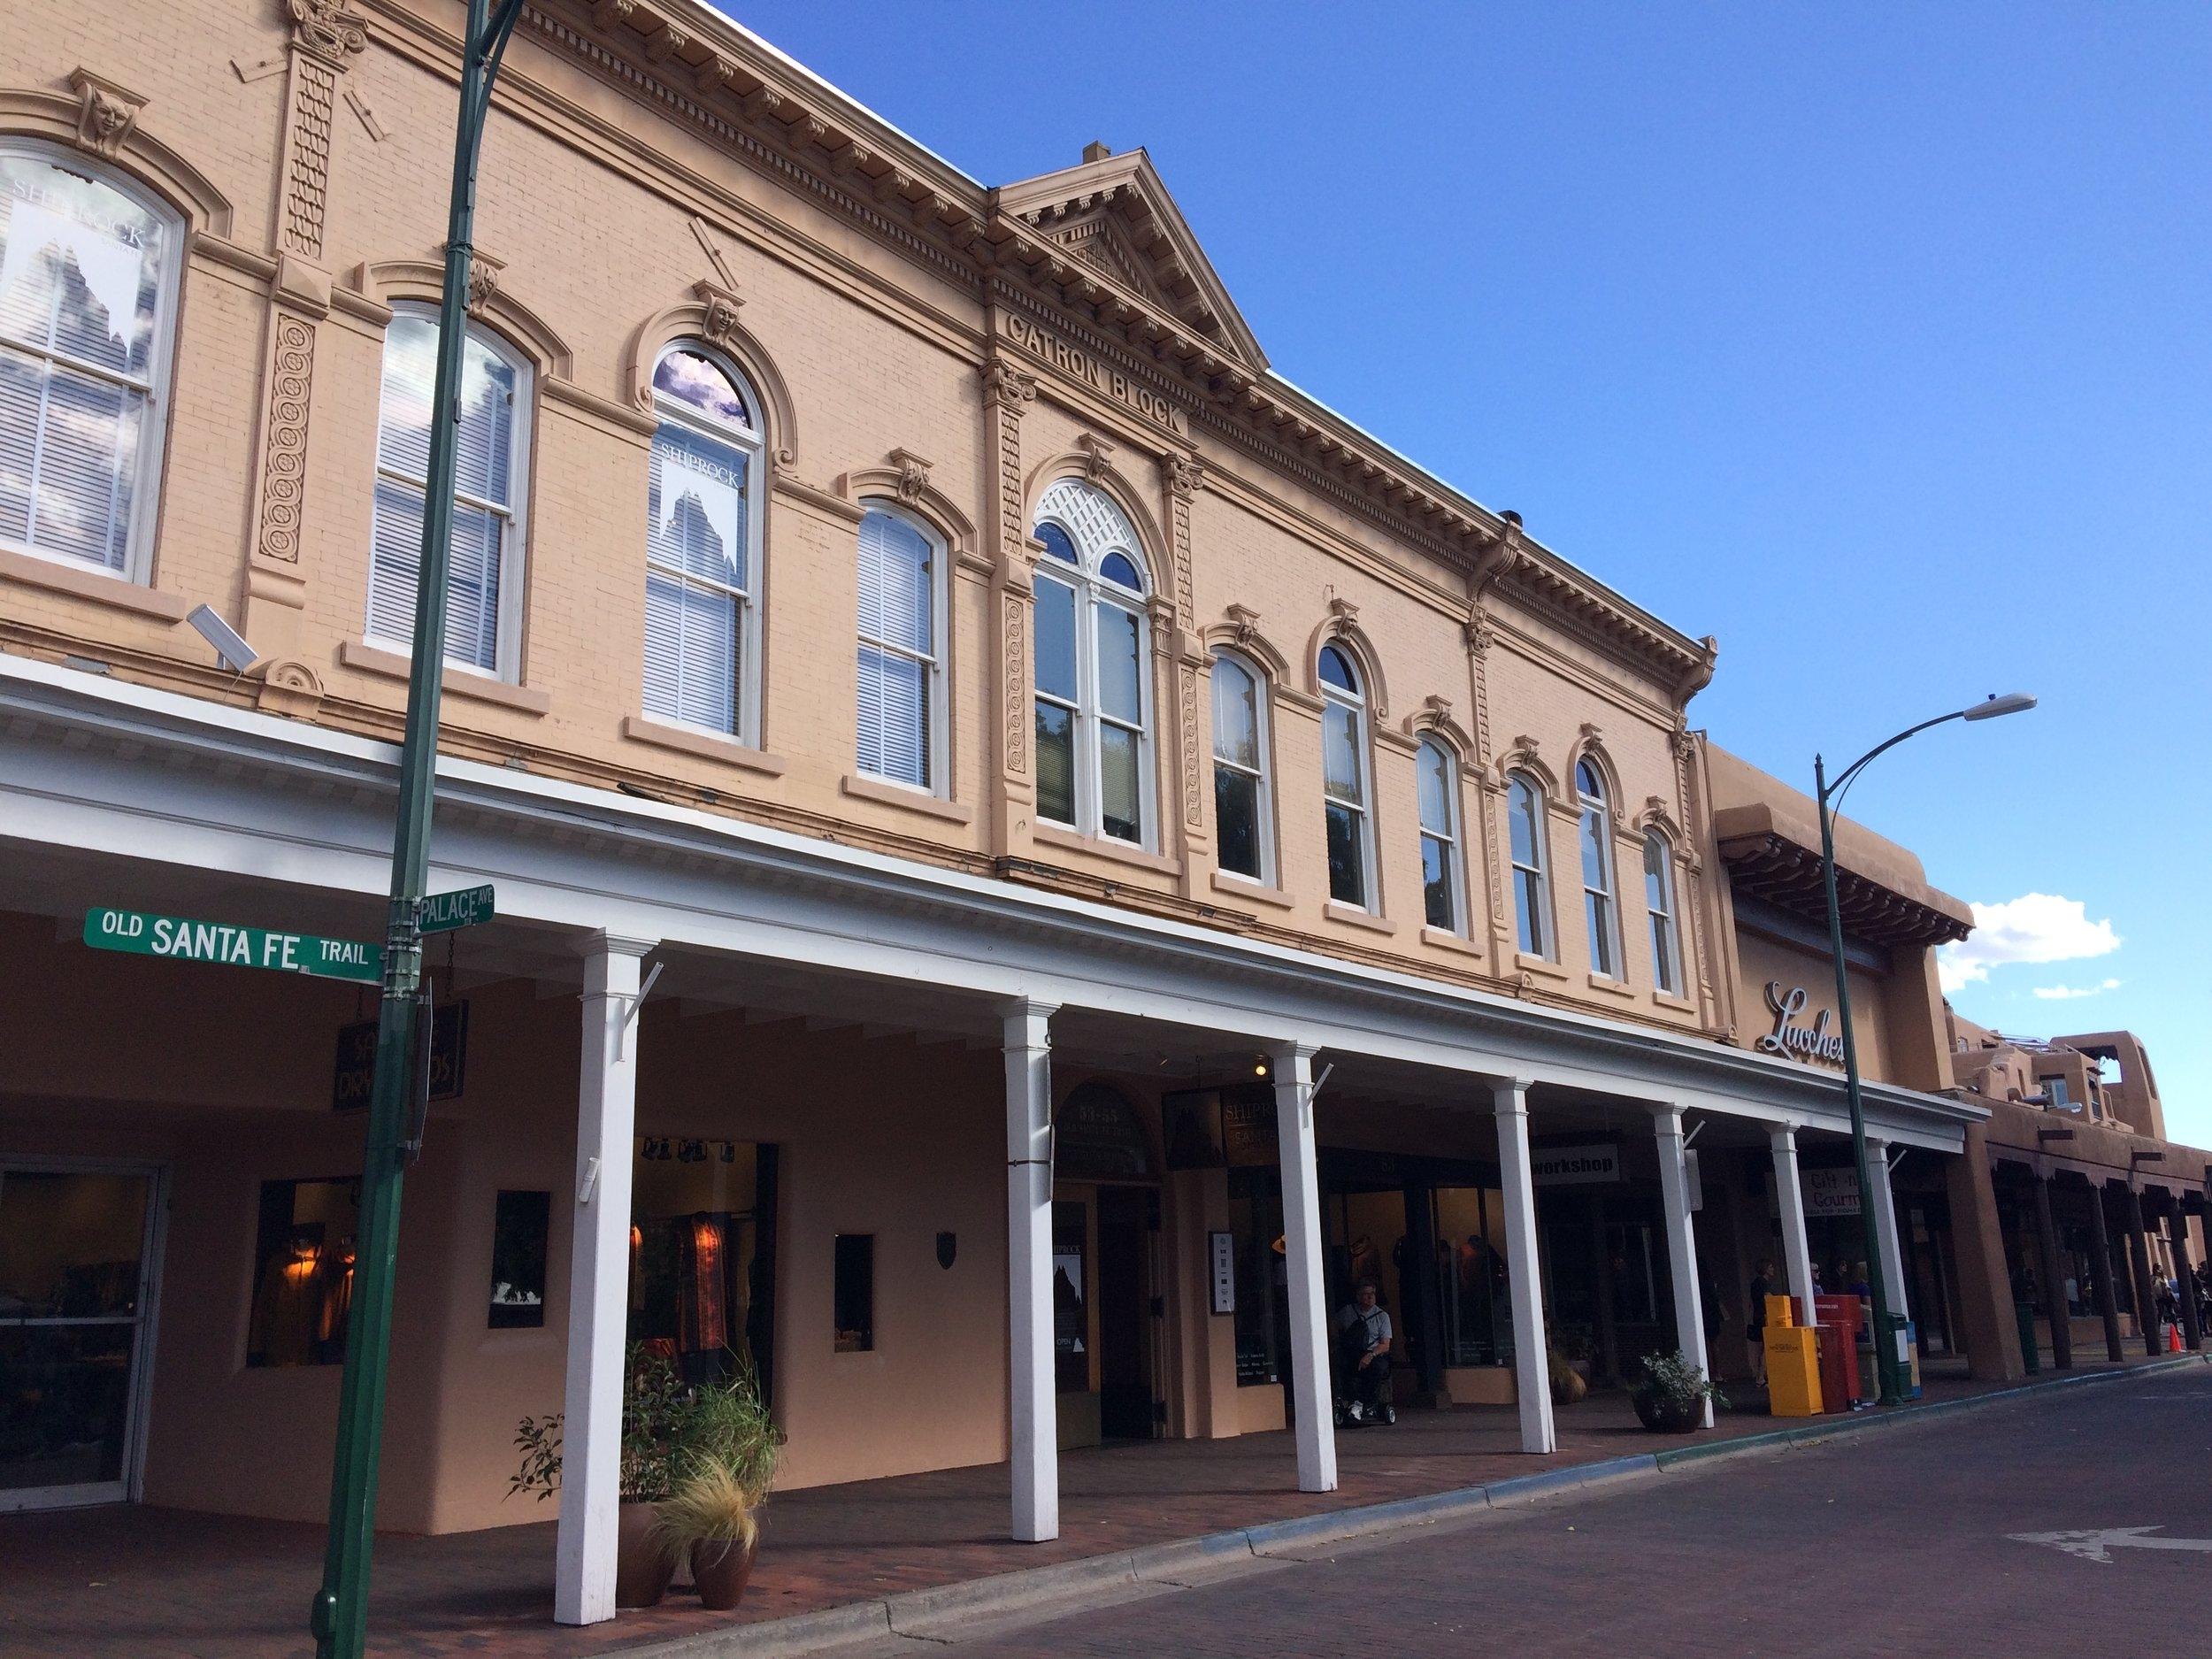 Catron Block, NE corner of Plaza on Old Santa Fe Trail